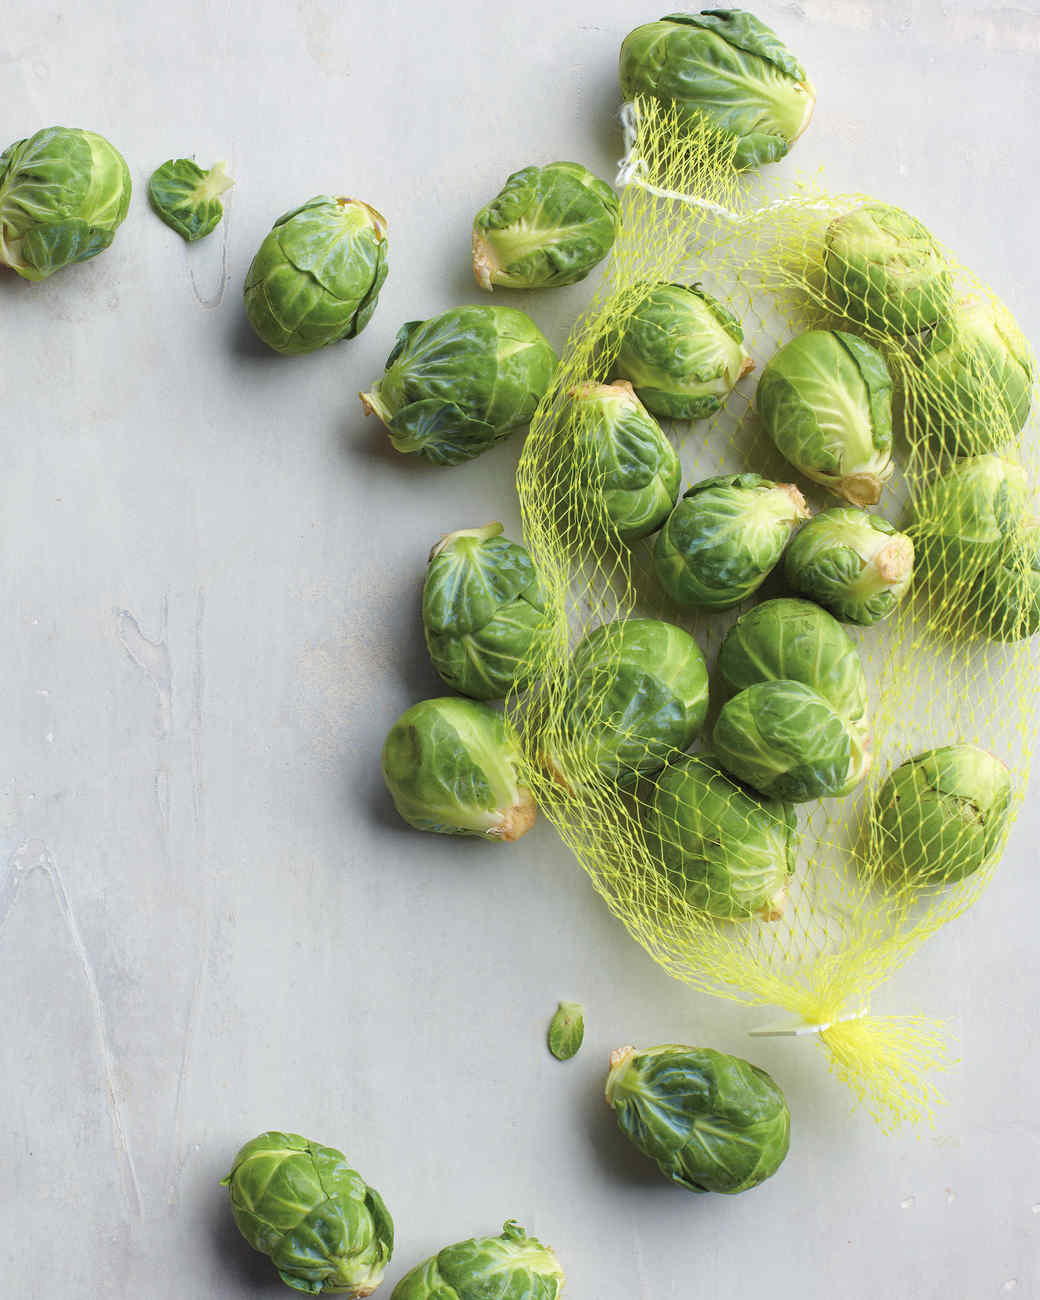 Family fun magazine brussel sprout recipe